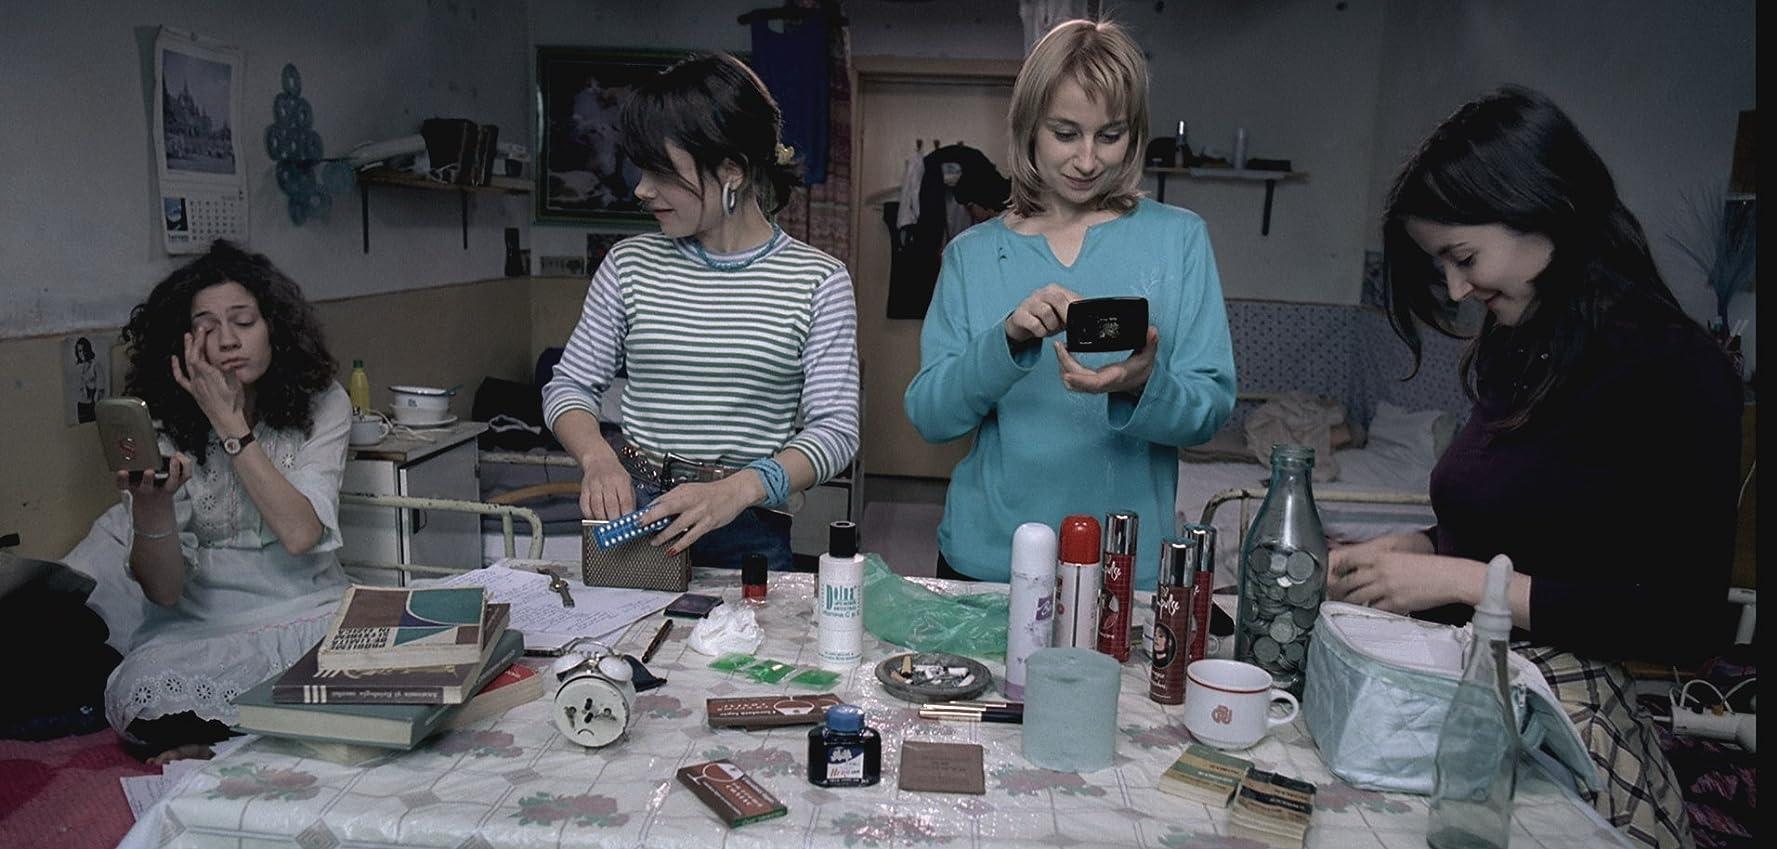 Anamaria Marinca, Catalina Harabagiu, Madalina Ghitescu, and Sanziana Tarta in 4 luni, 3 saptamâni si 2 zile (2007)